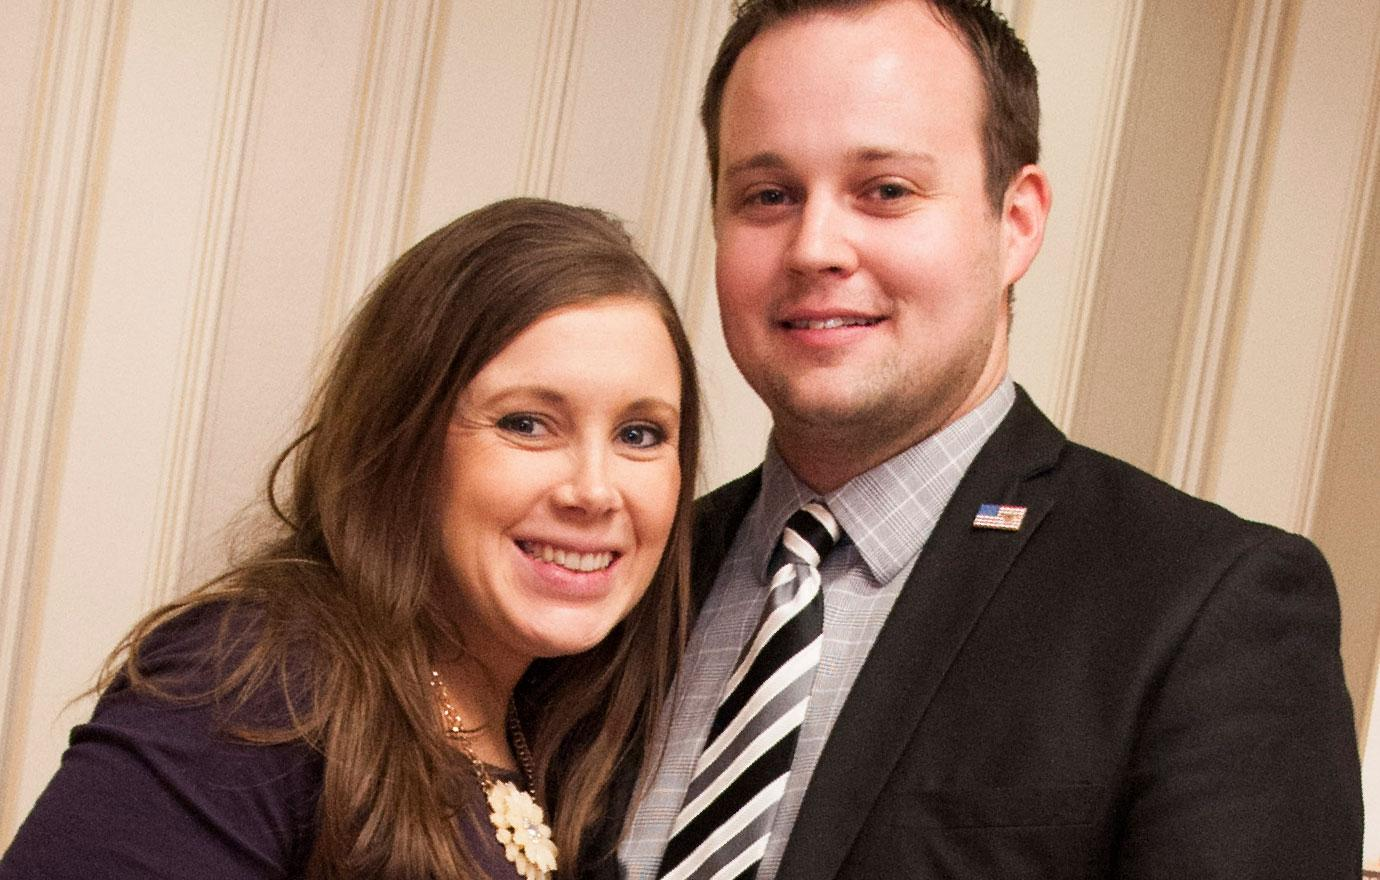 Anna Duggar Praises Marriage To Husband Josh After Molestation Scandal